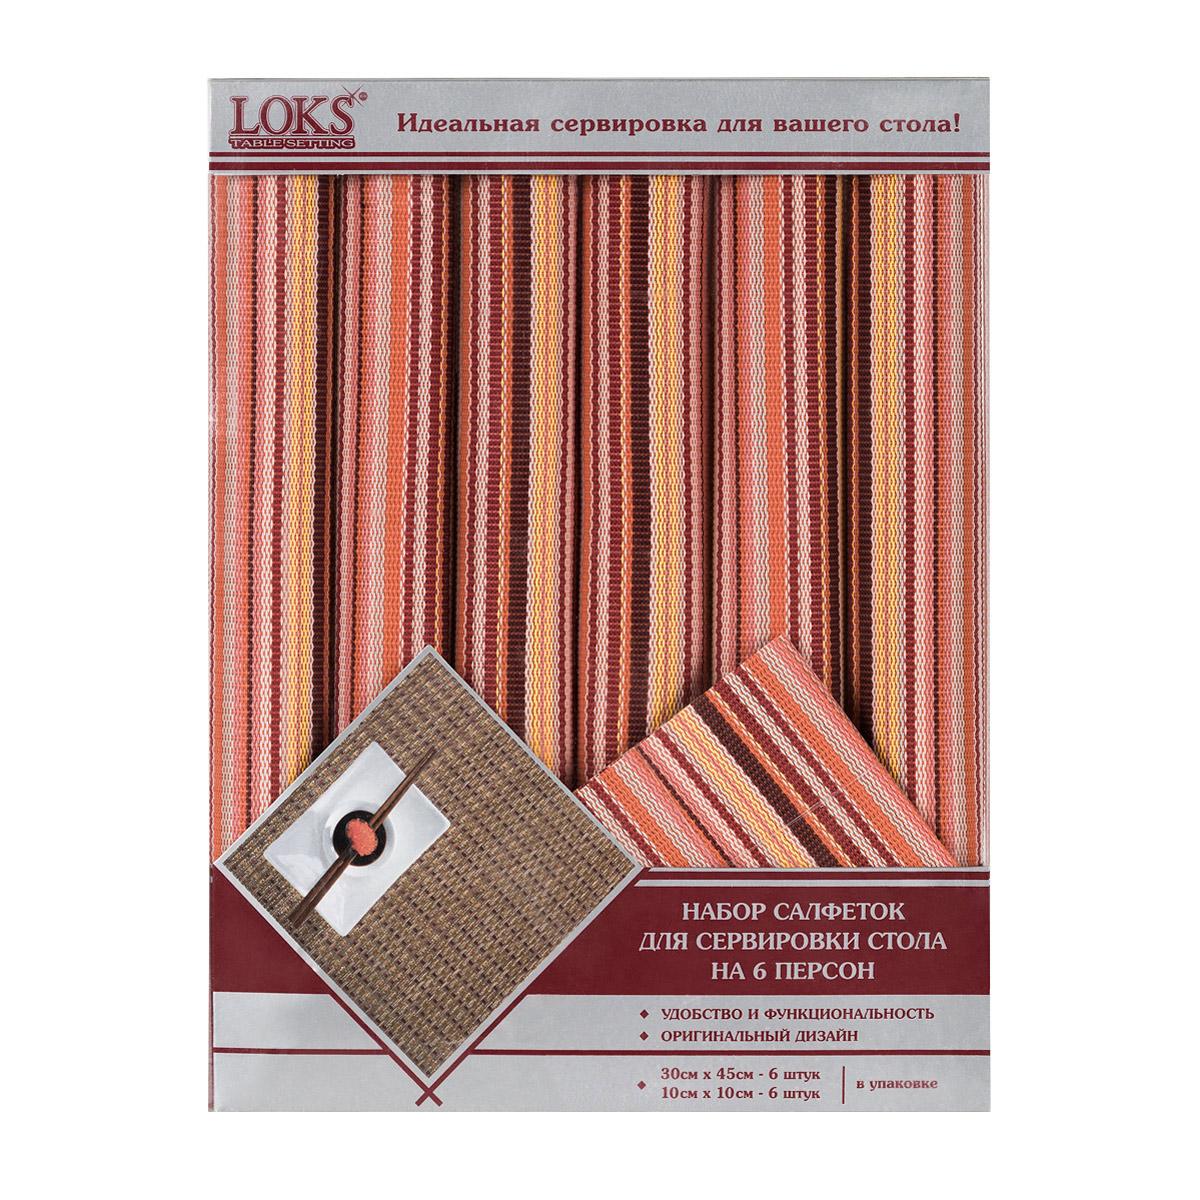 Набор виниловых салфеток для кухни LOKS, цвет: оранжевый, 12 шт. P400-103